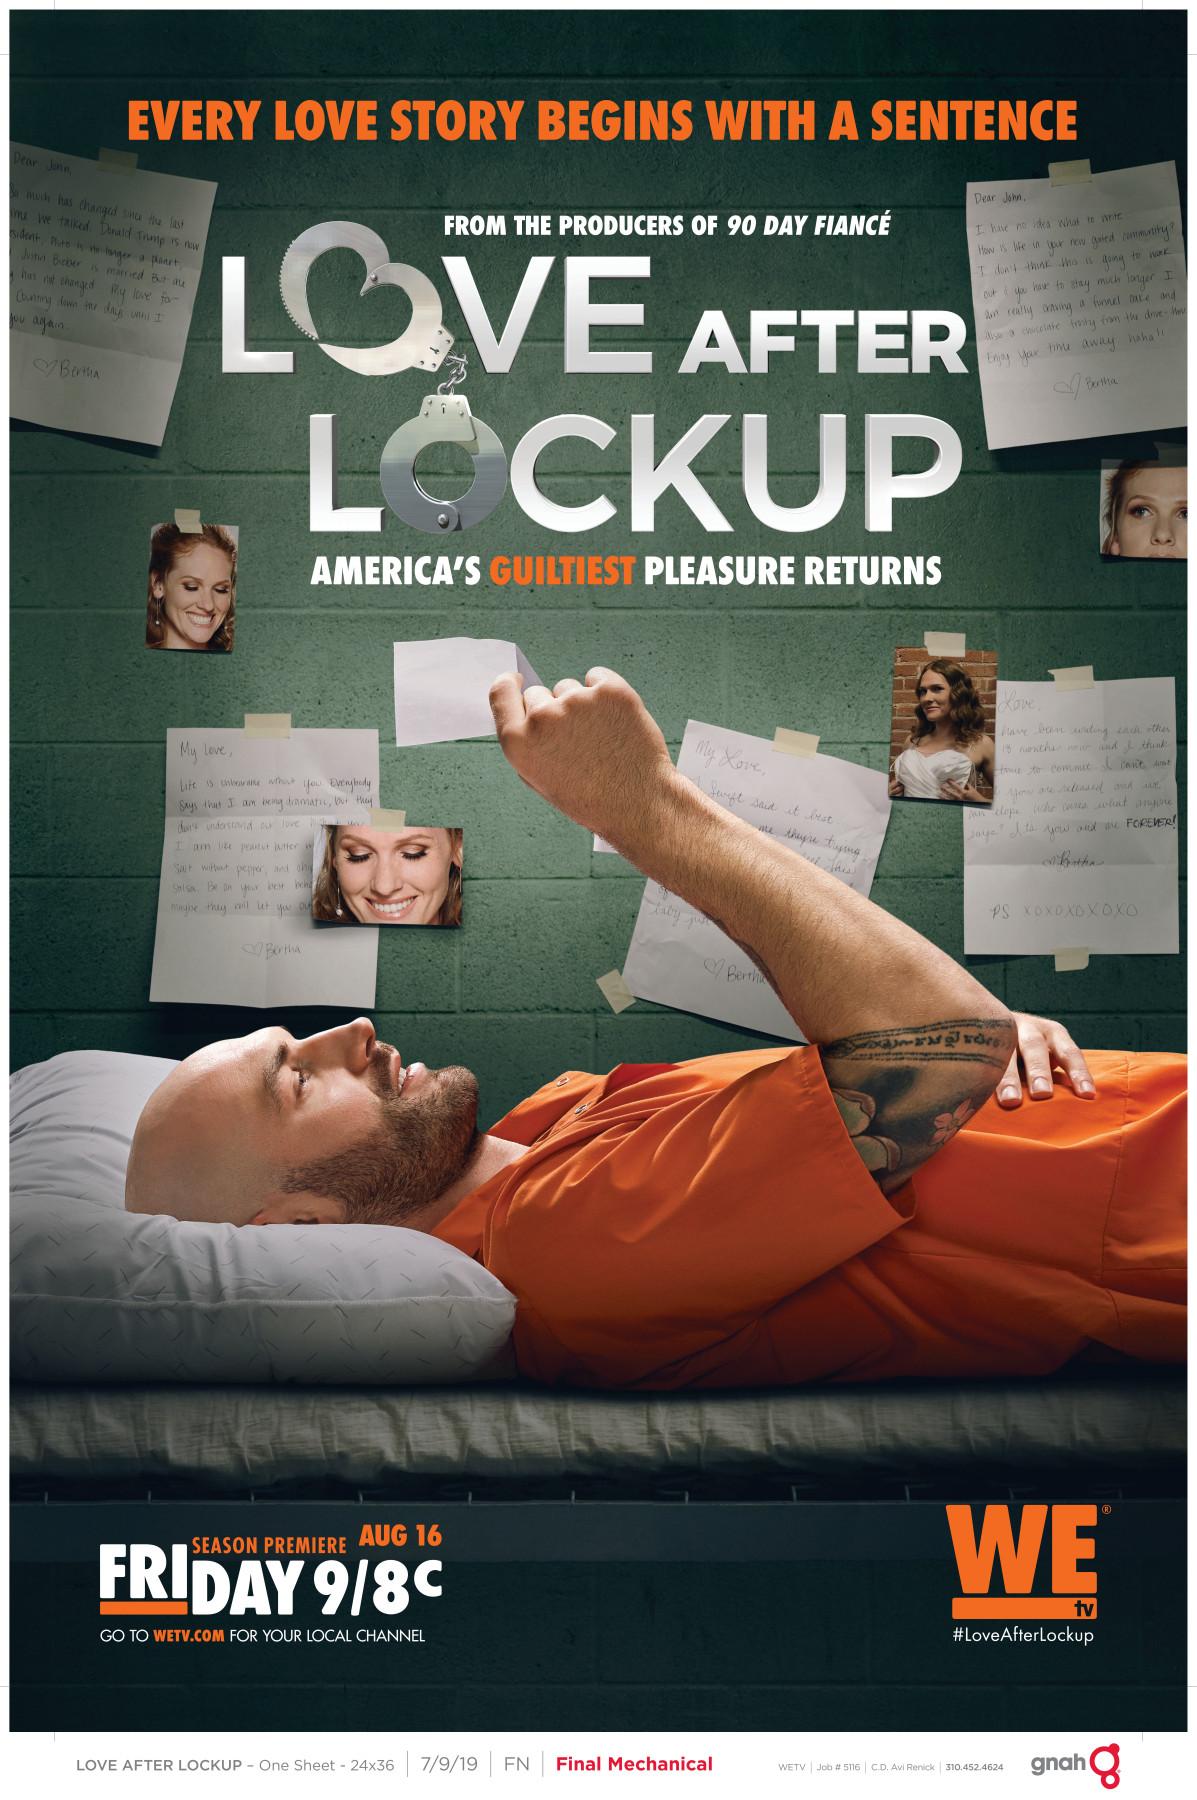 Love After Lockup Season 2 key art and cast photos